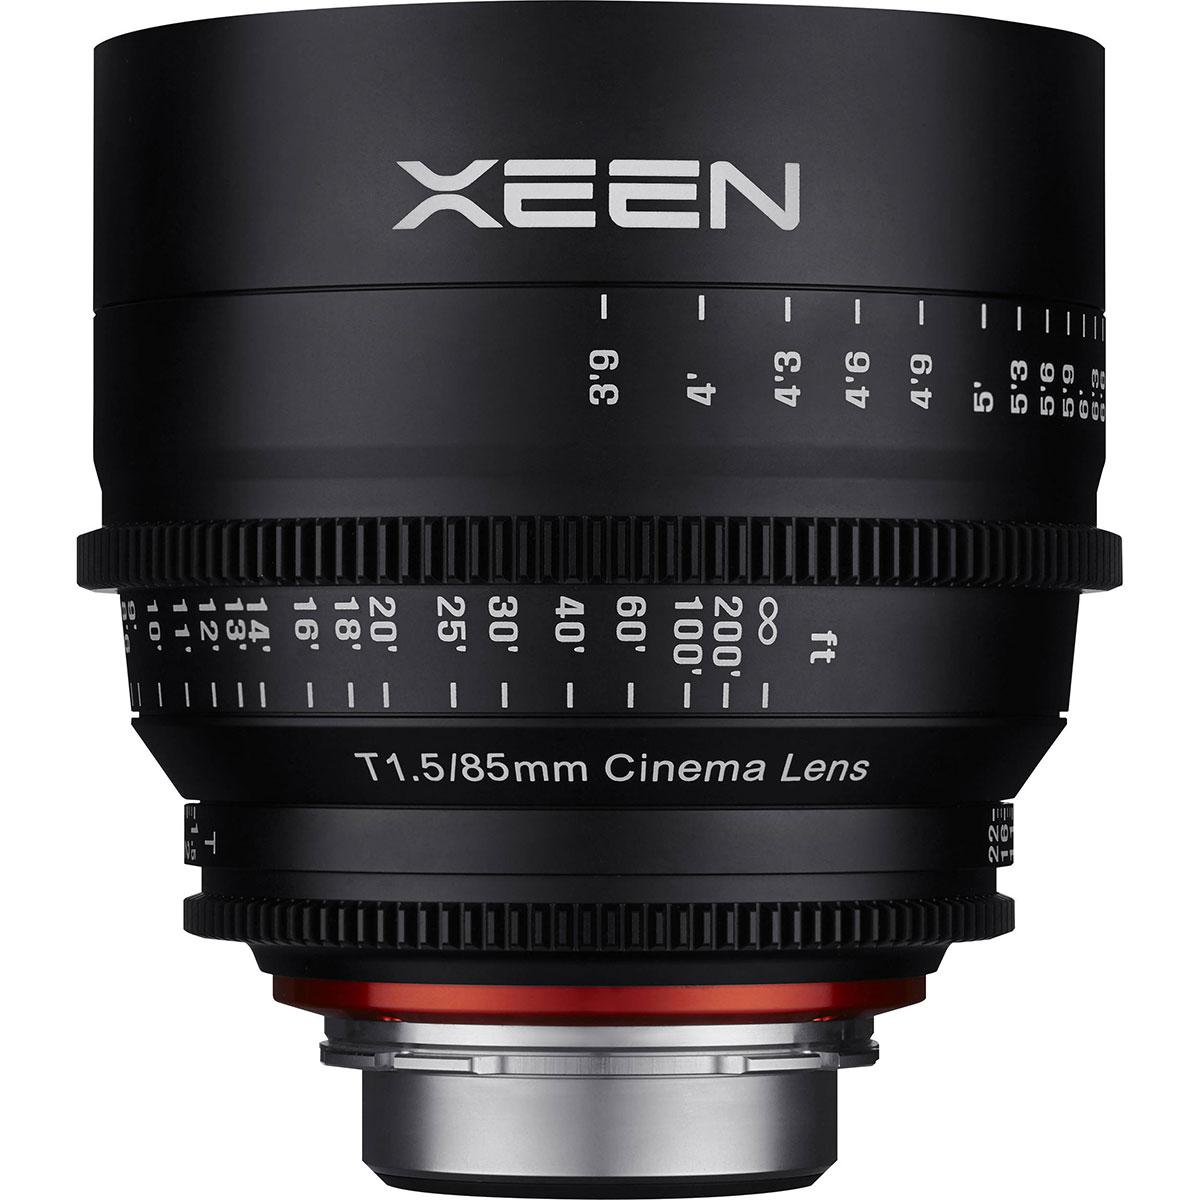 لنز سامیانگ مدل Xeen 85mm T1.5 مناسب برای دوربین سونی